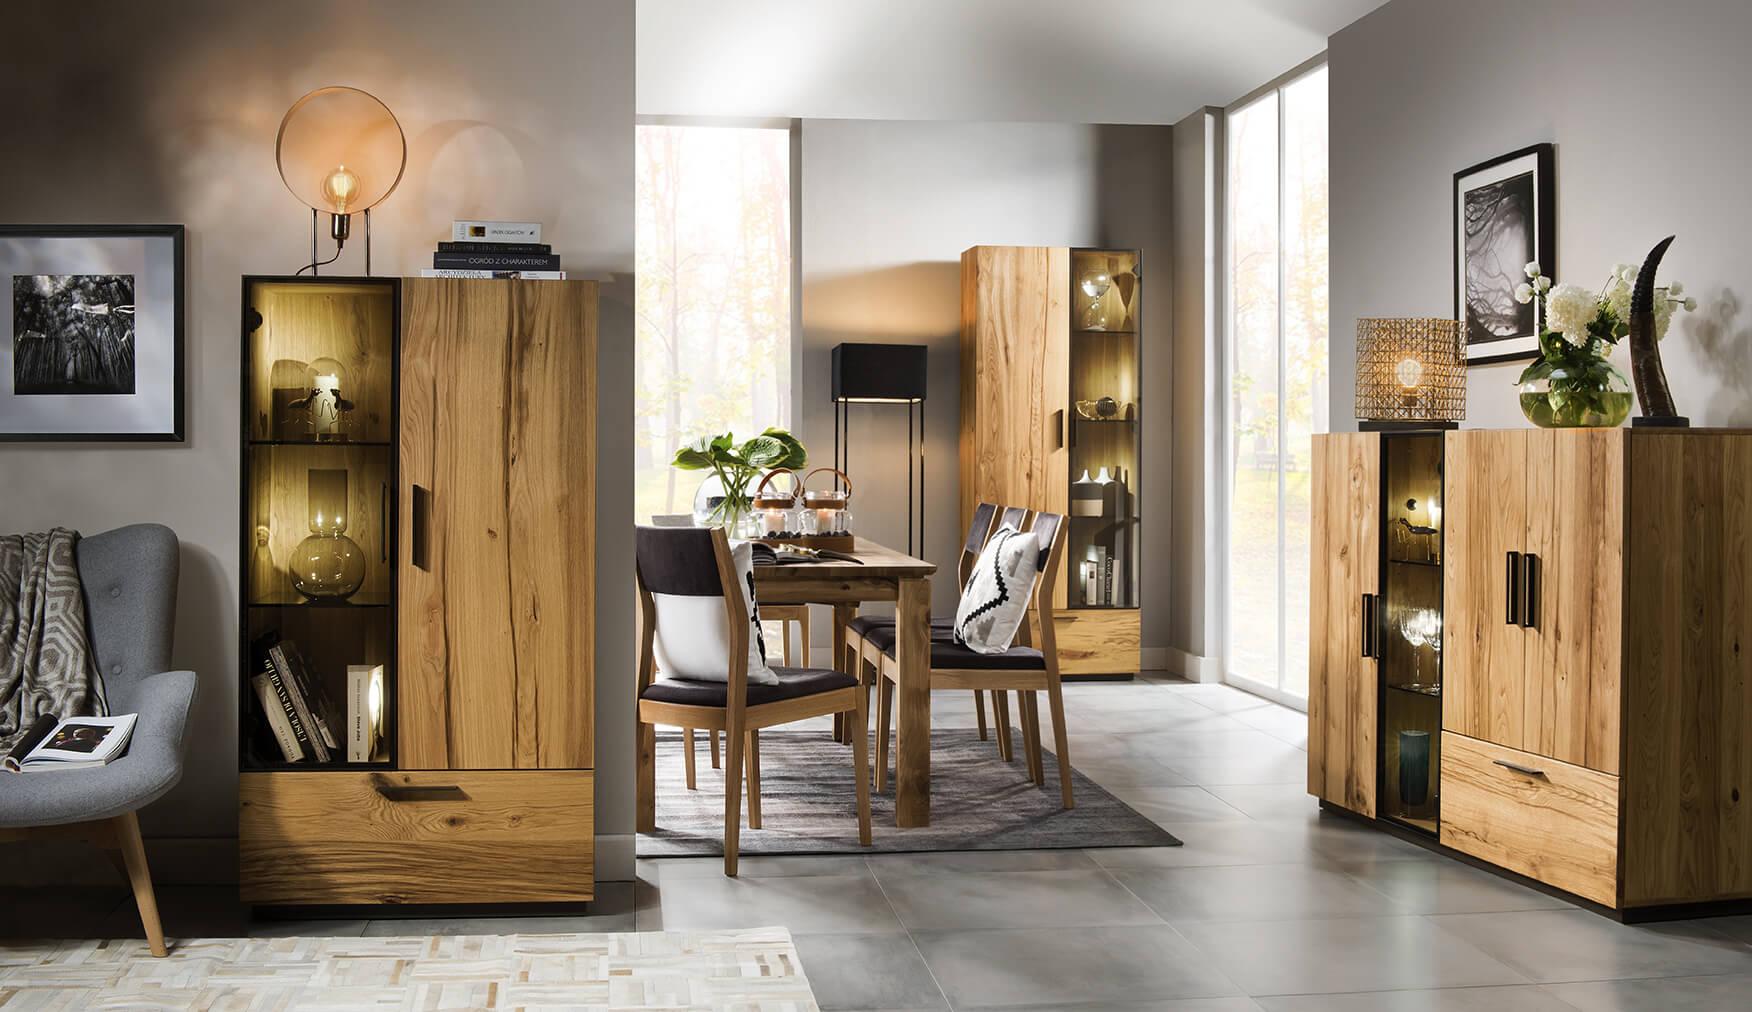 meble-loftowe-drewno-natura